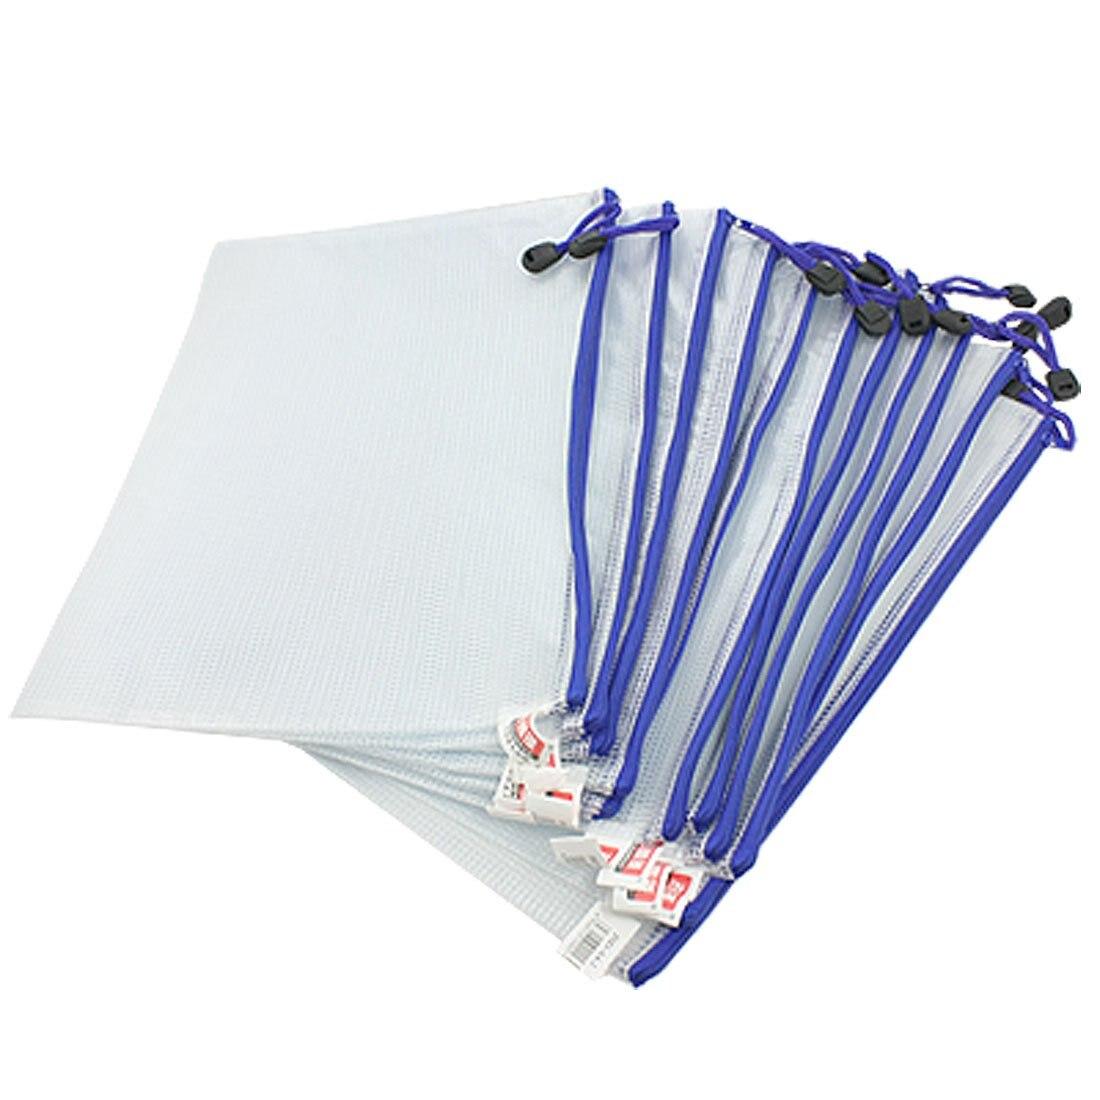 SOSW-12 Pcs White Plastic Zipper Pen File Document Bags Folders Pockets